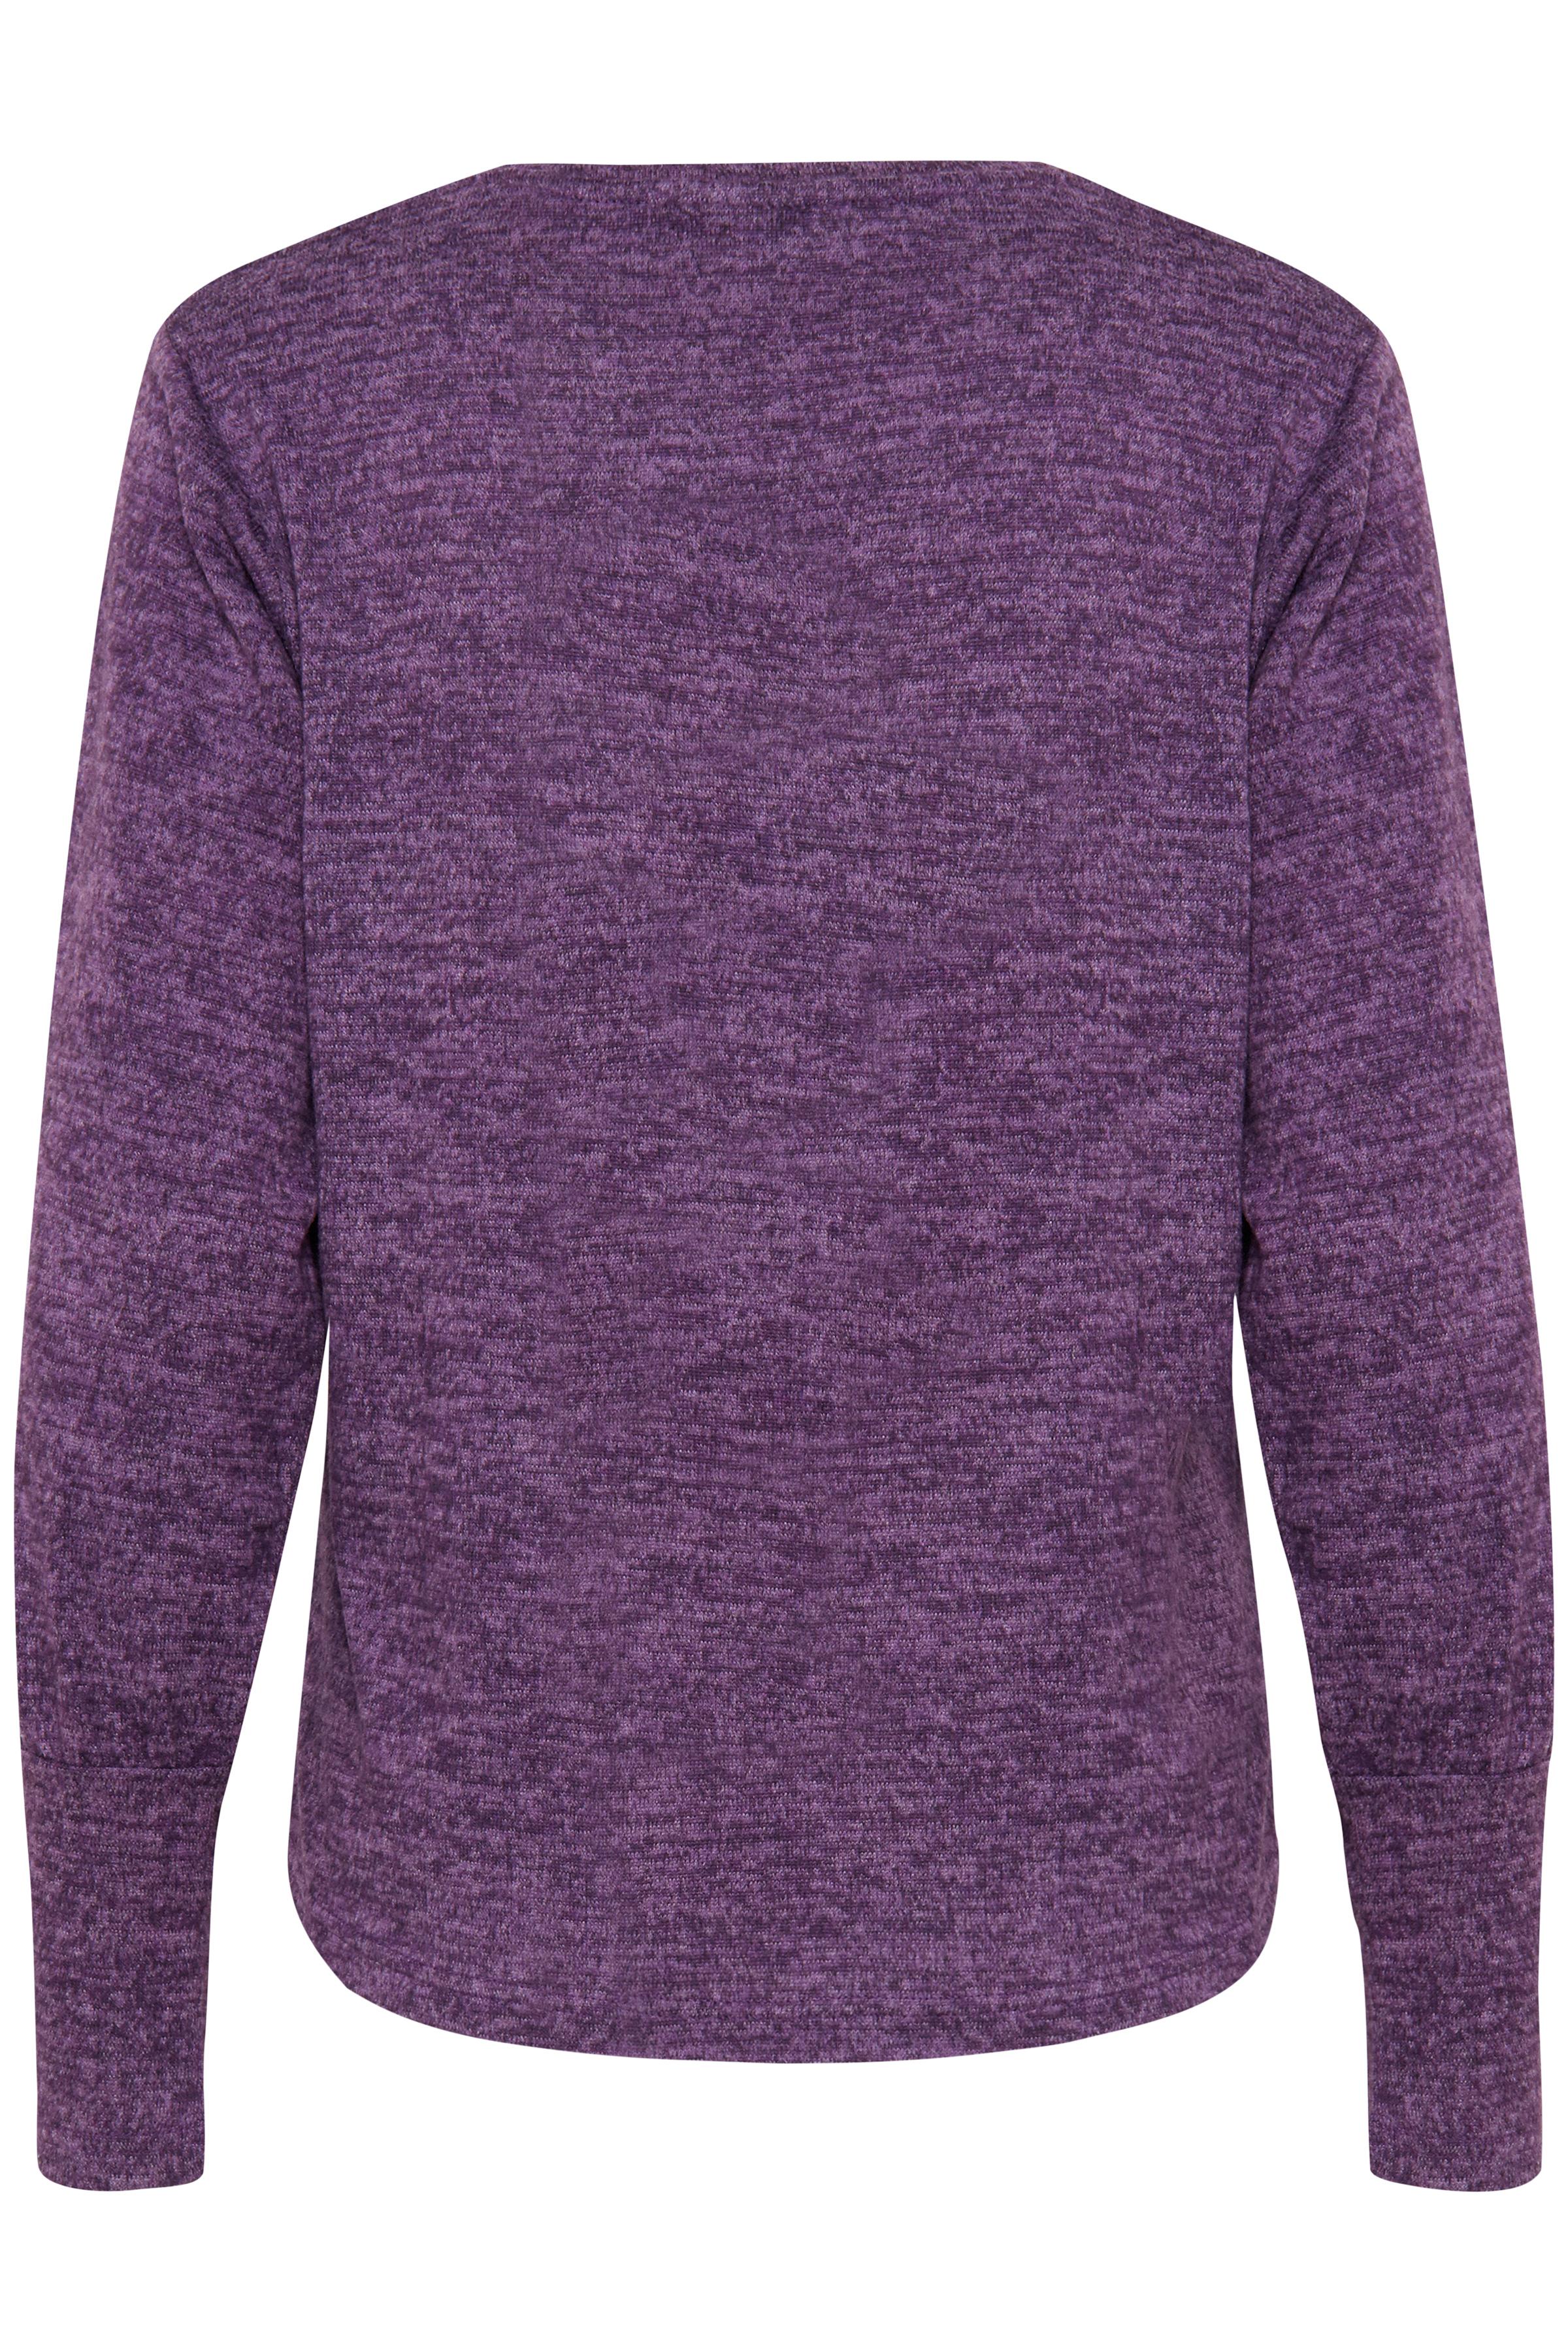 Imperial Purple Mel. Langærmet T-shirt fra b.young – Køb Imperial Purple Mel. Langærmet T-shirt fra str. XS-XXL her